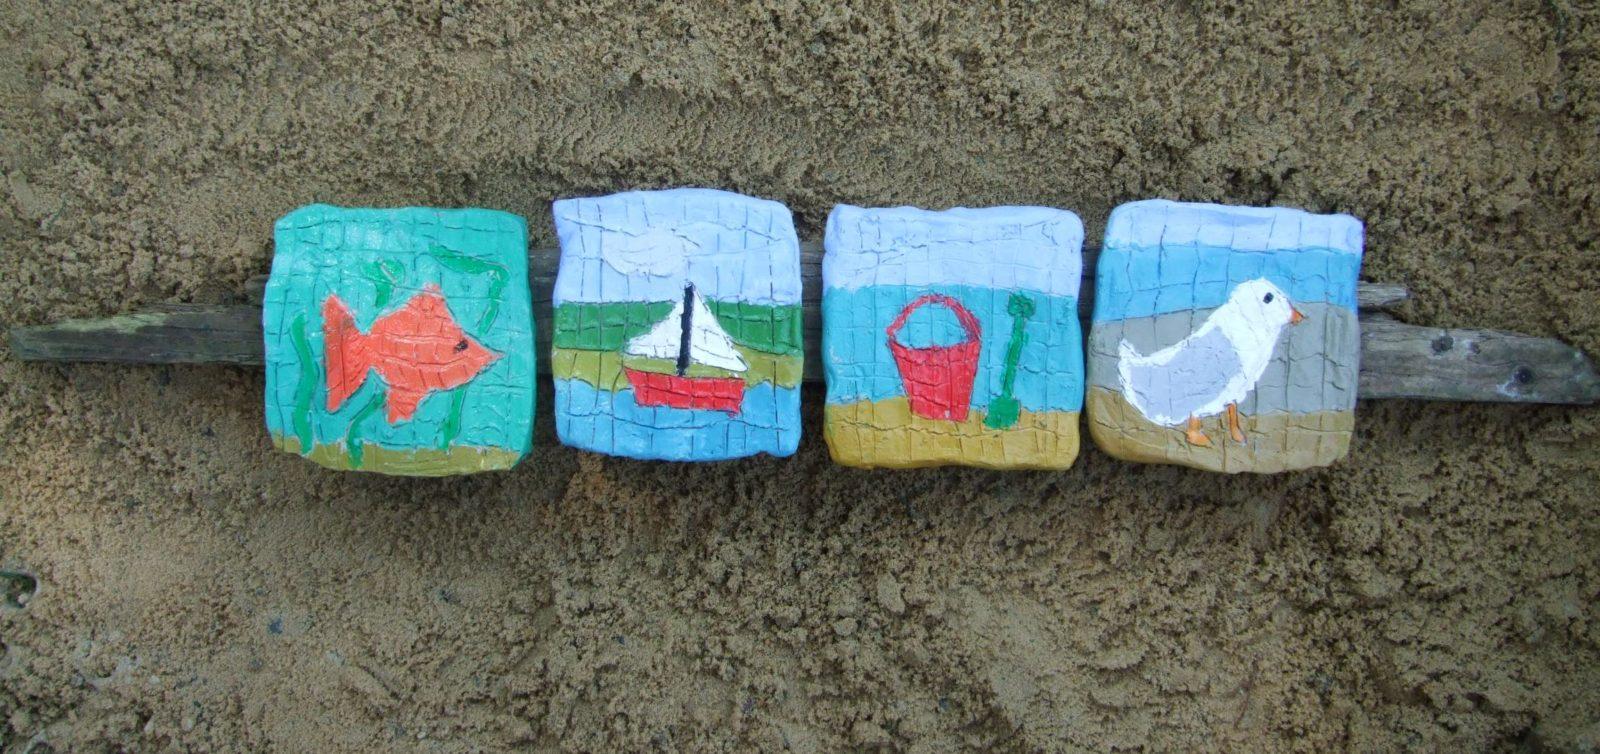 203 || 790 || Seaside Tiles Elizabeth Baily